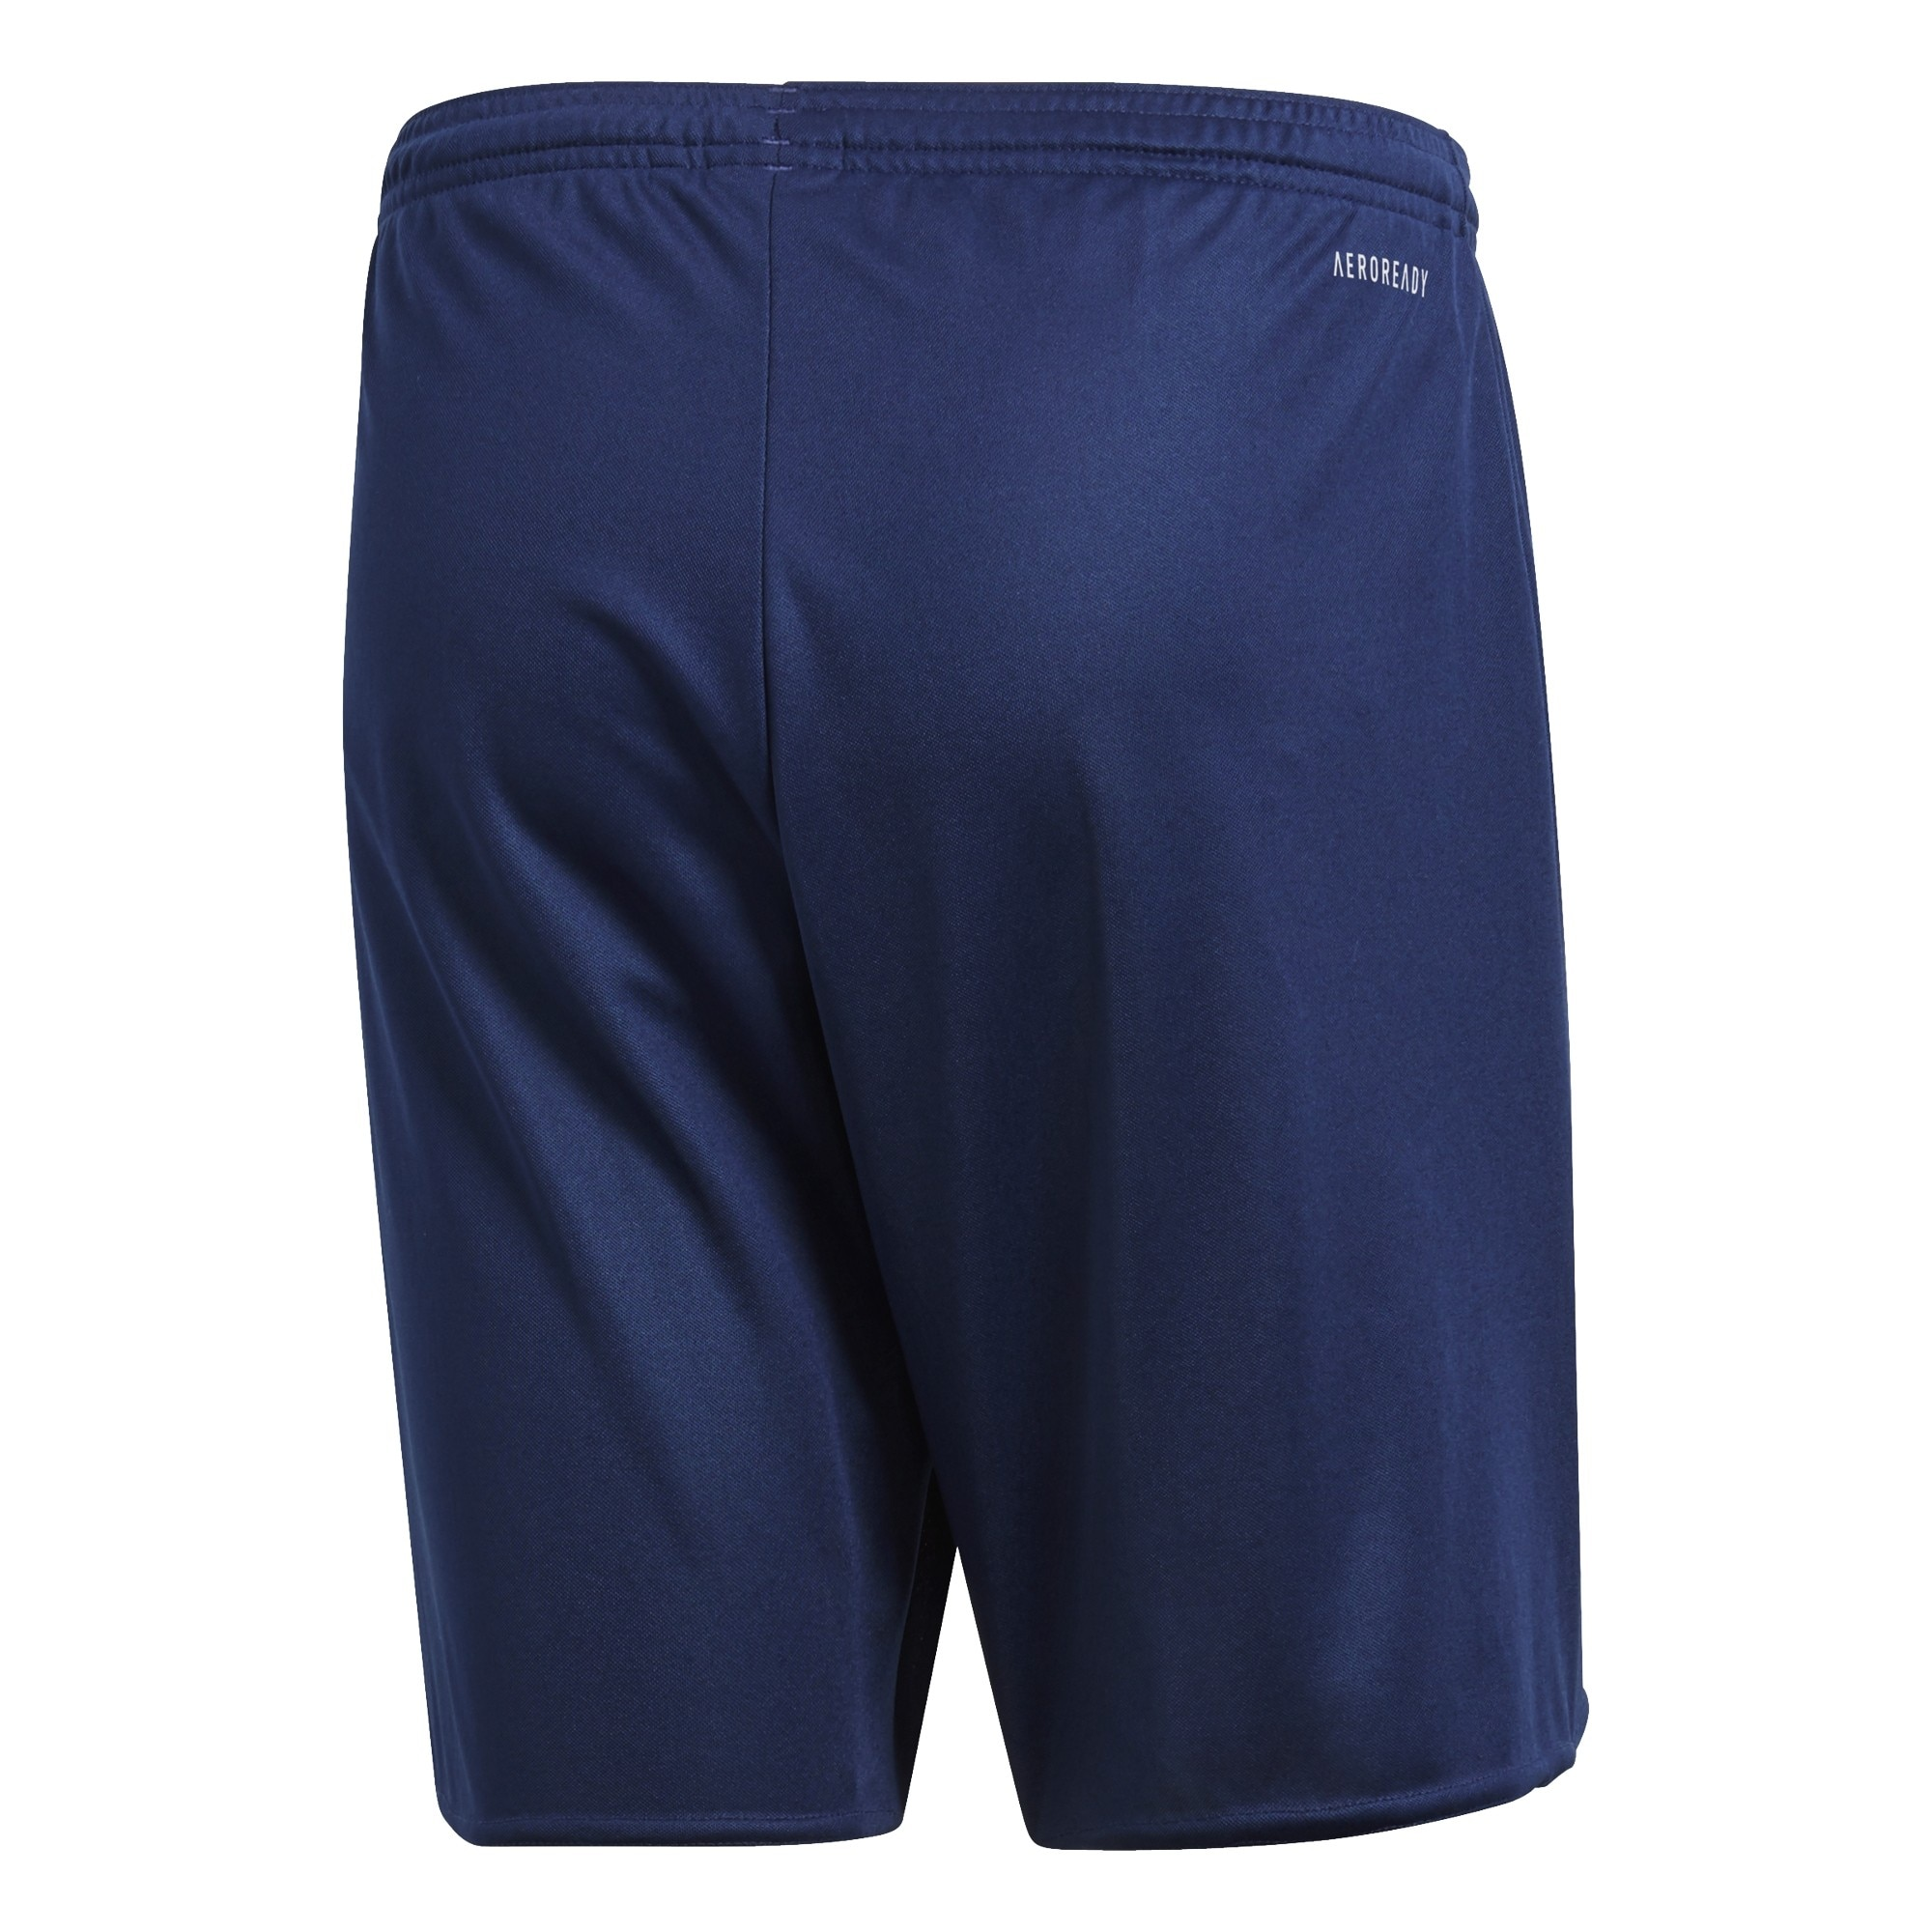 Adidas Parma 16 Spillershorts WB Marine